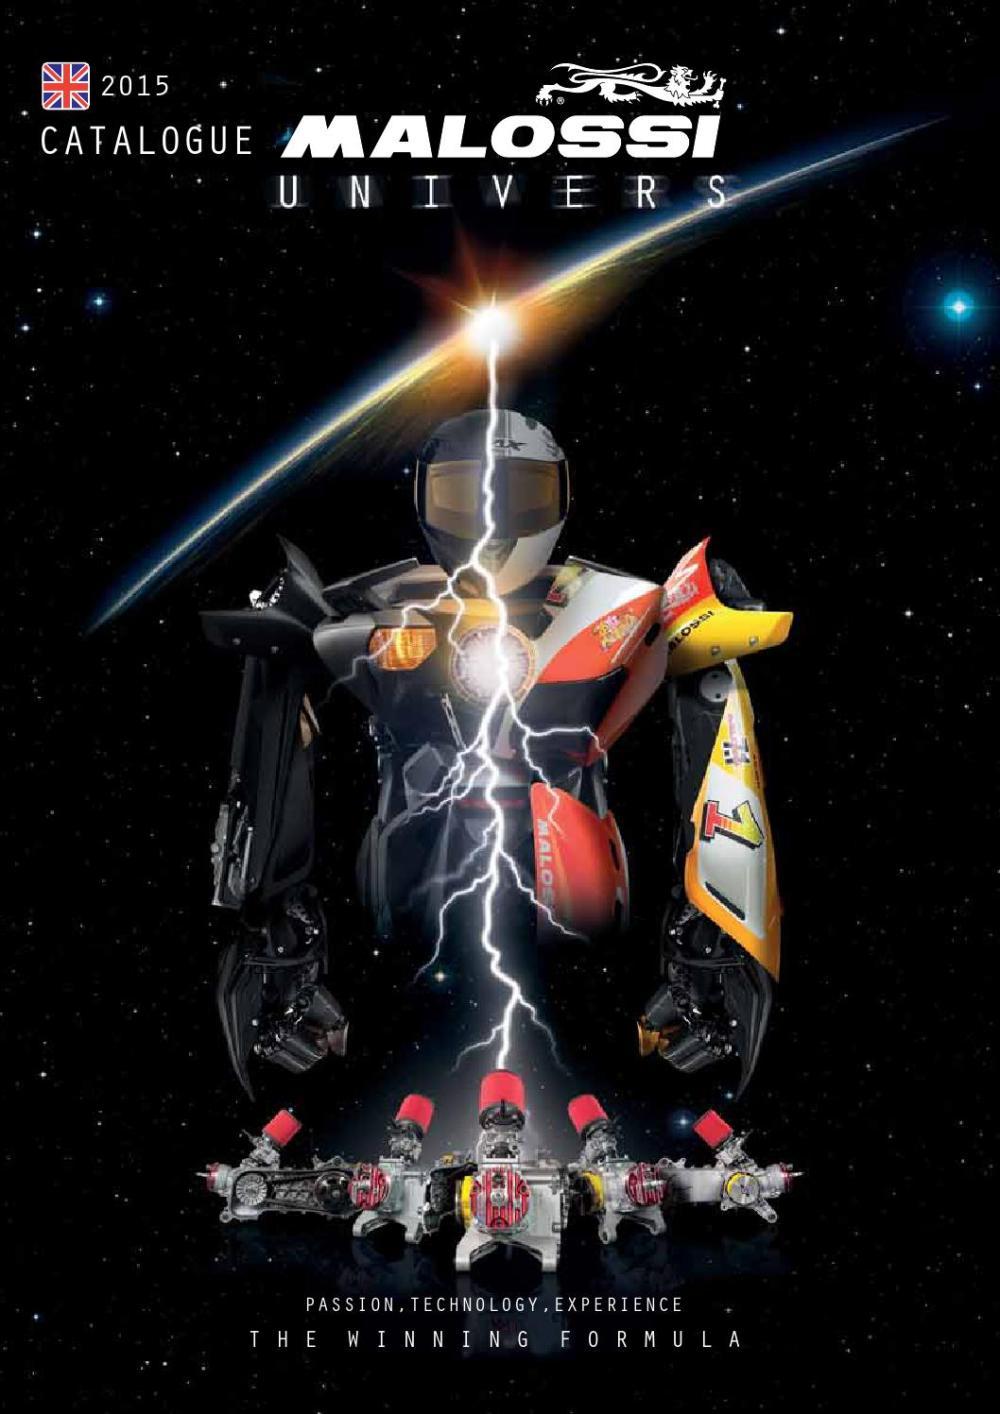 medium resolution of univers malossi catalogue by malossi issuu